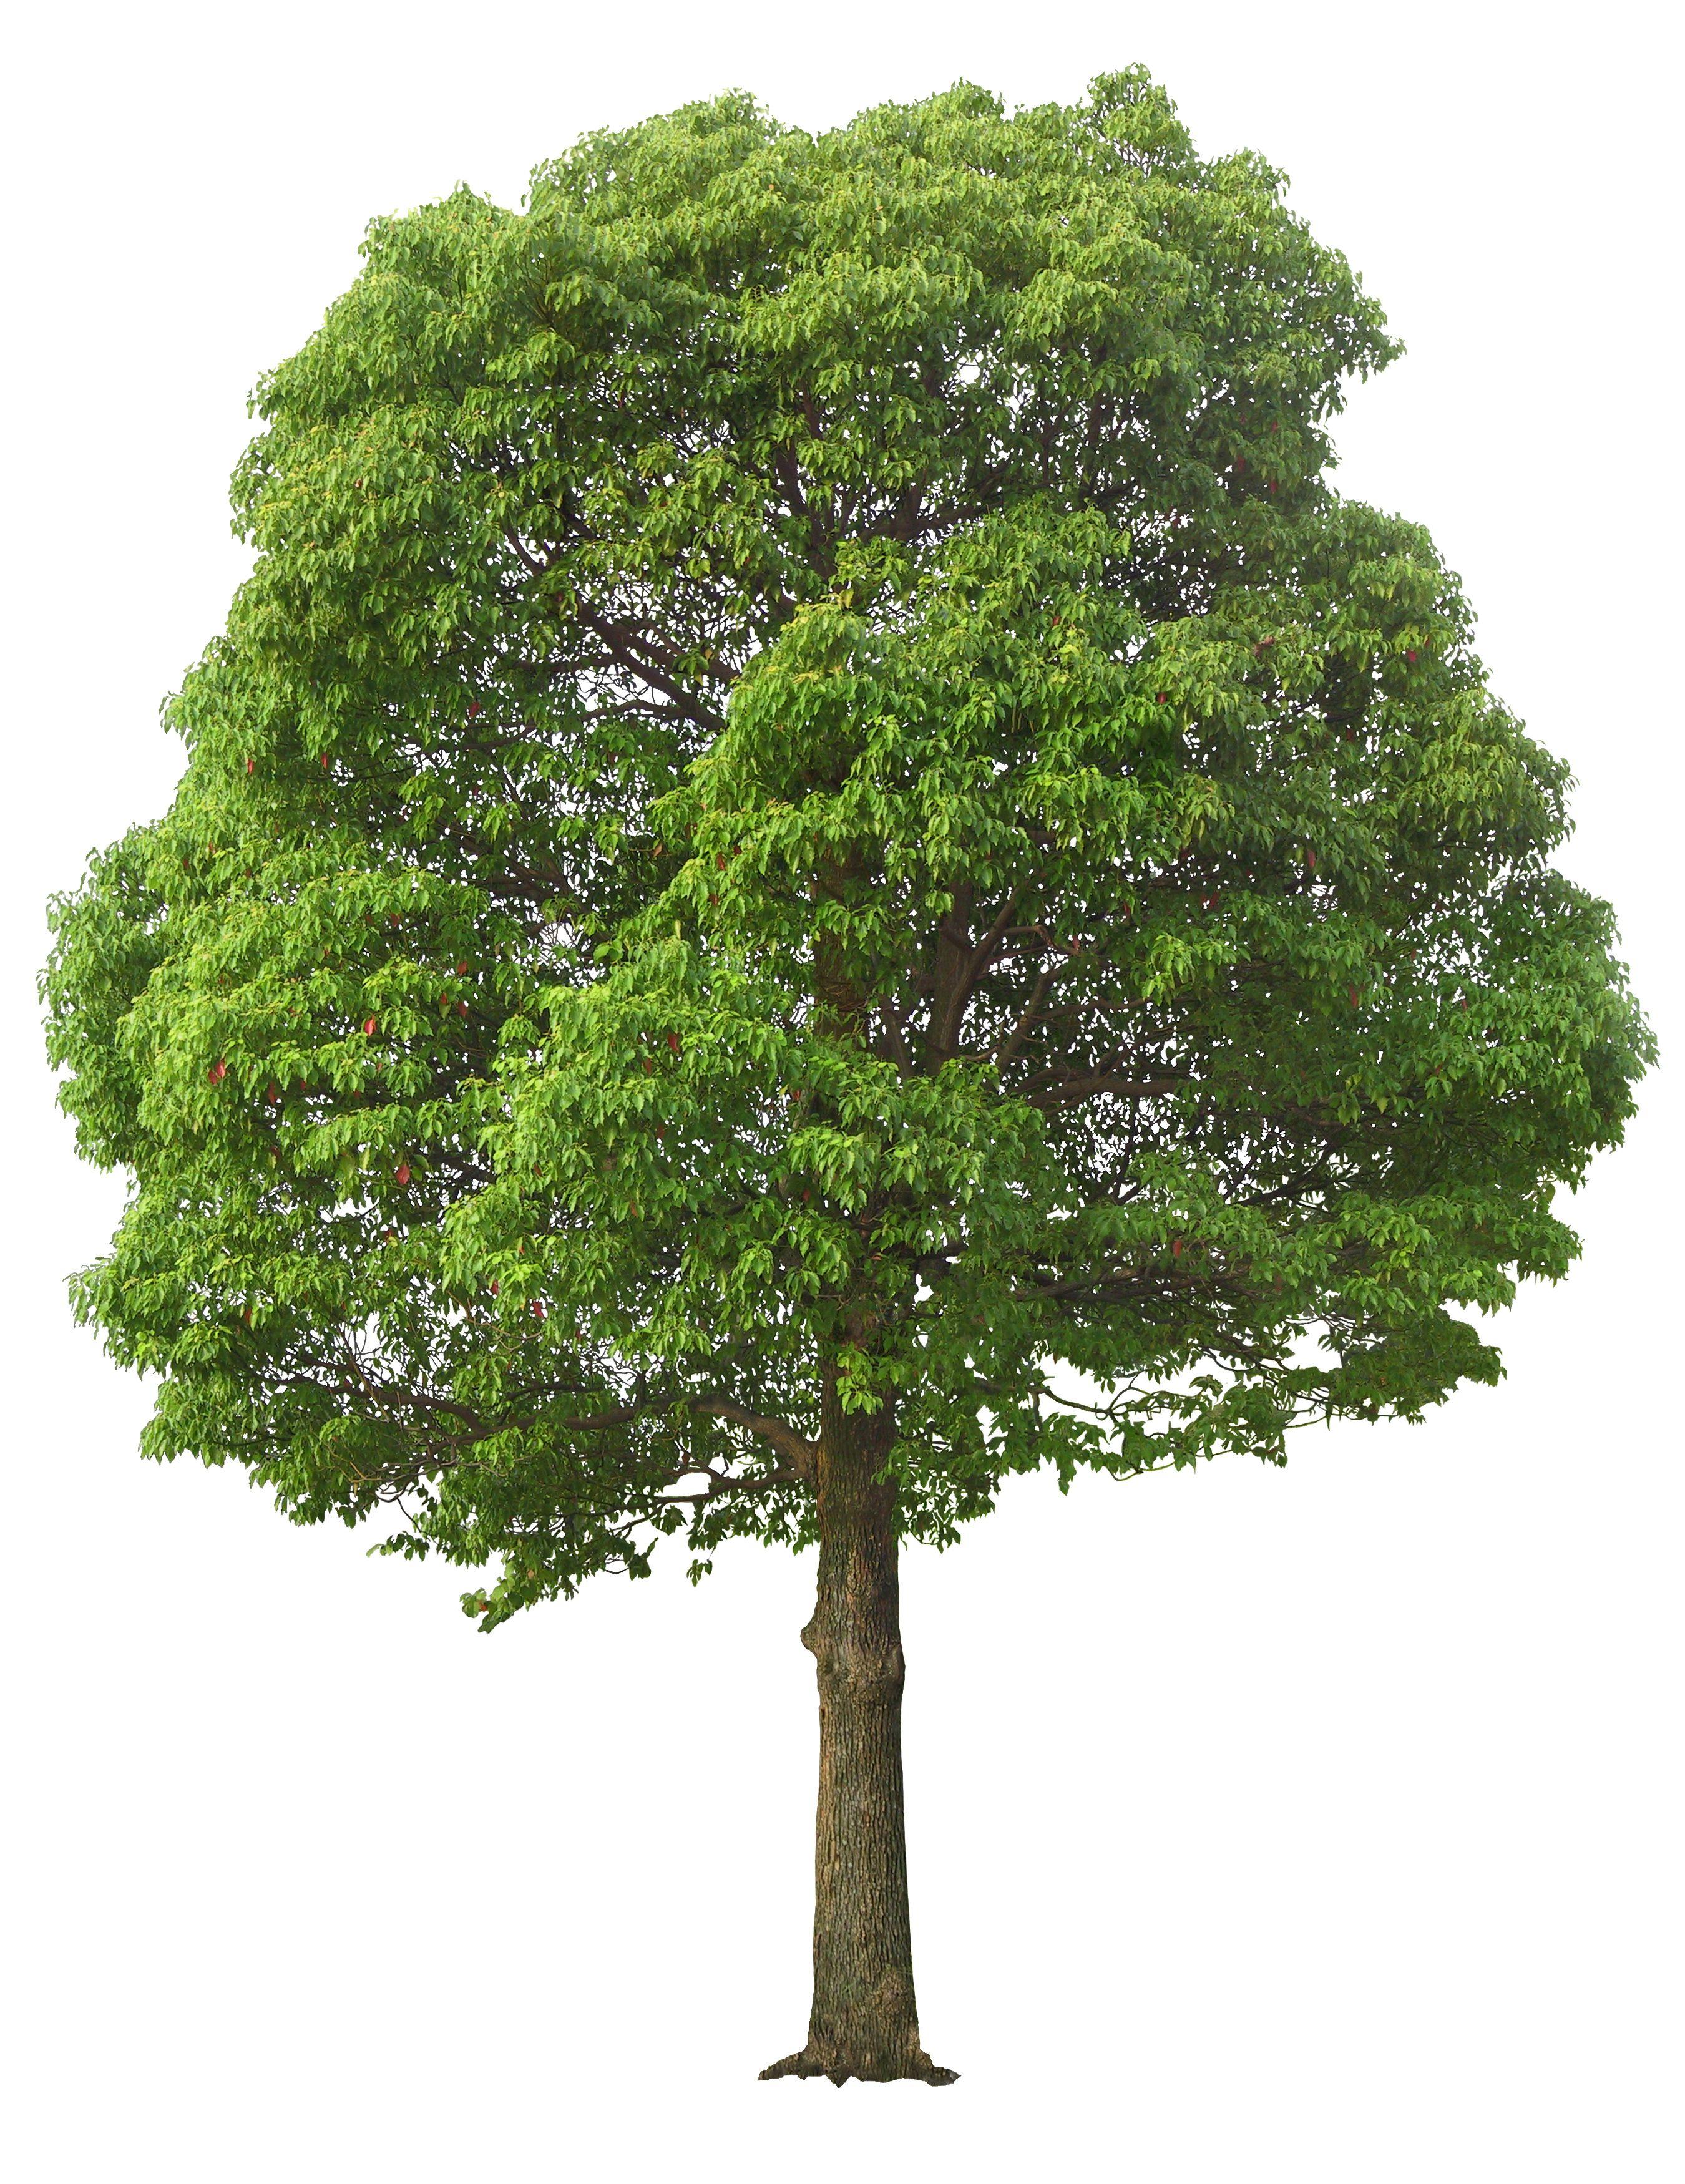 Tree Psd Tree Photoshop Tree Graphic Street